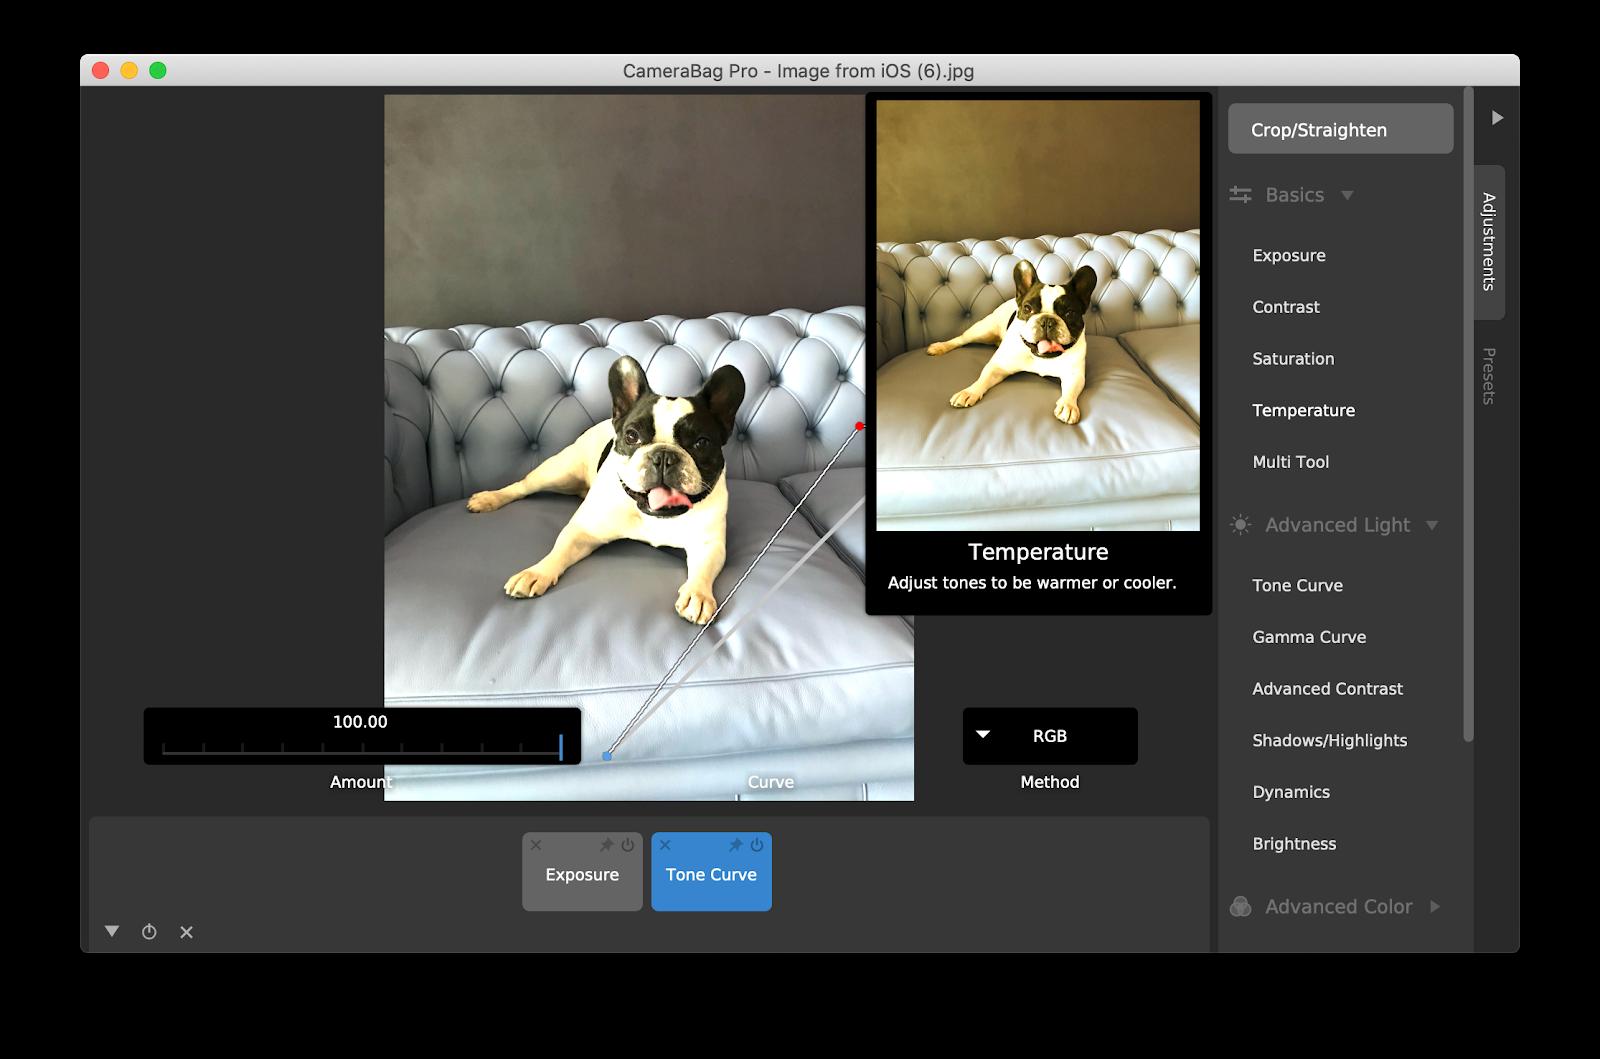 CameraBag Pro photo editing app